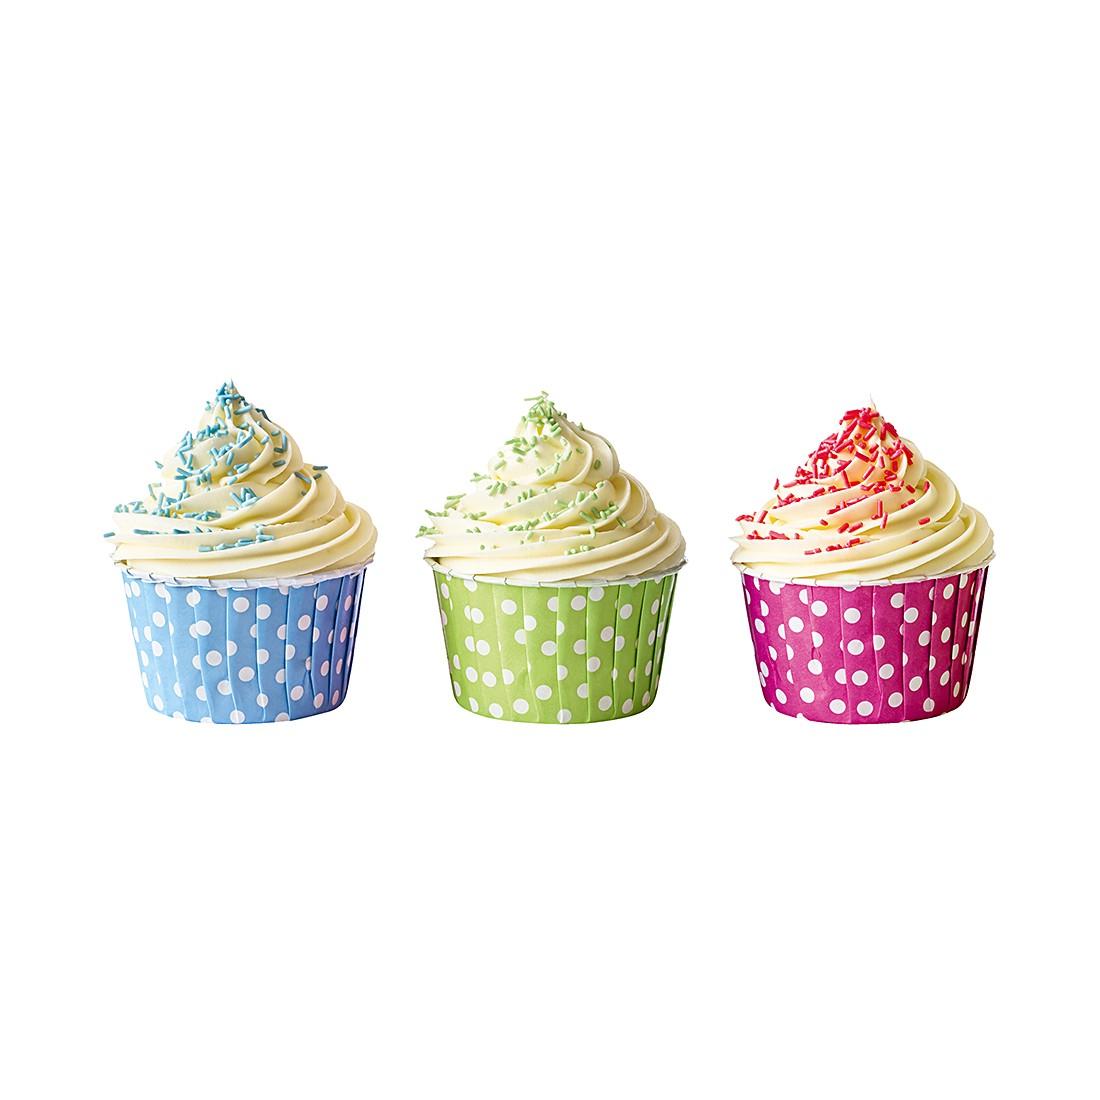 Wandafbeelding Cup Cakes, Pro Art